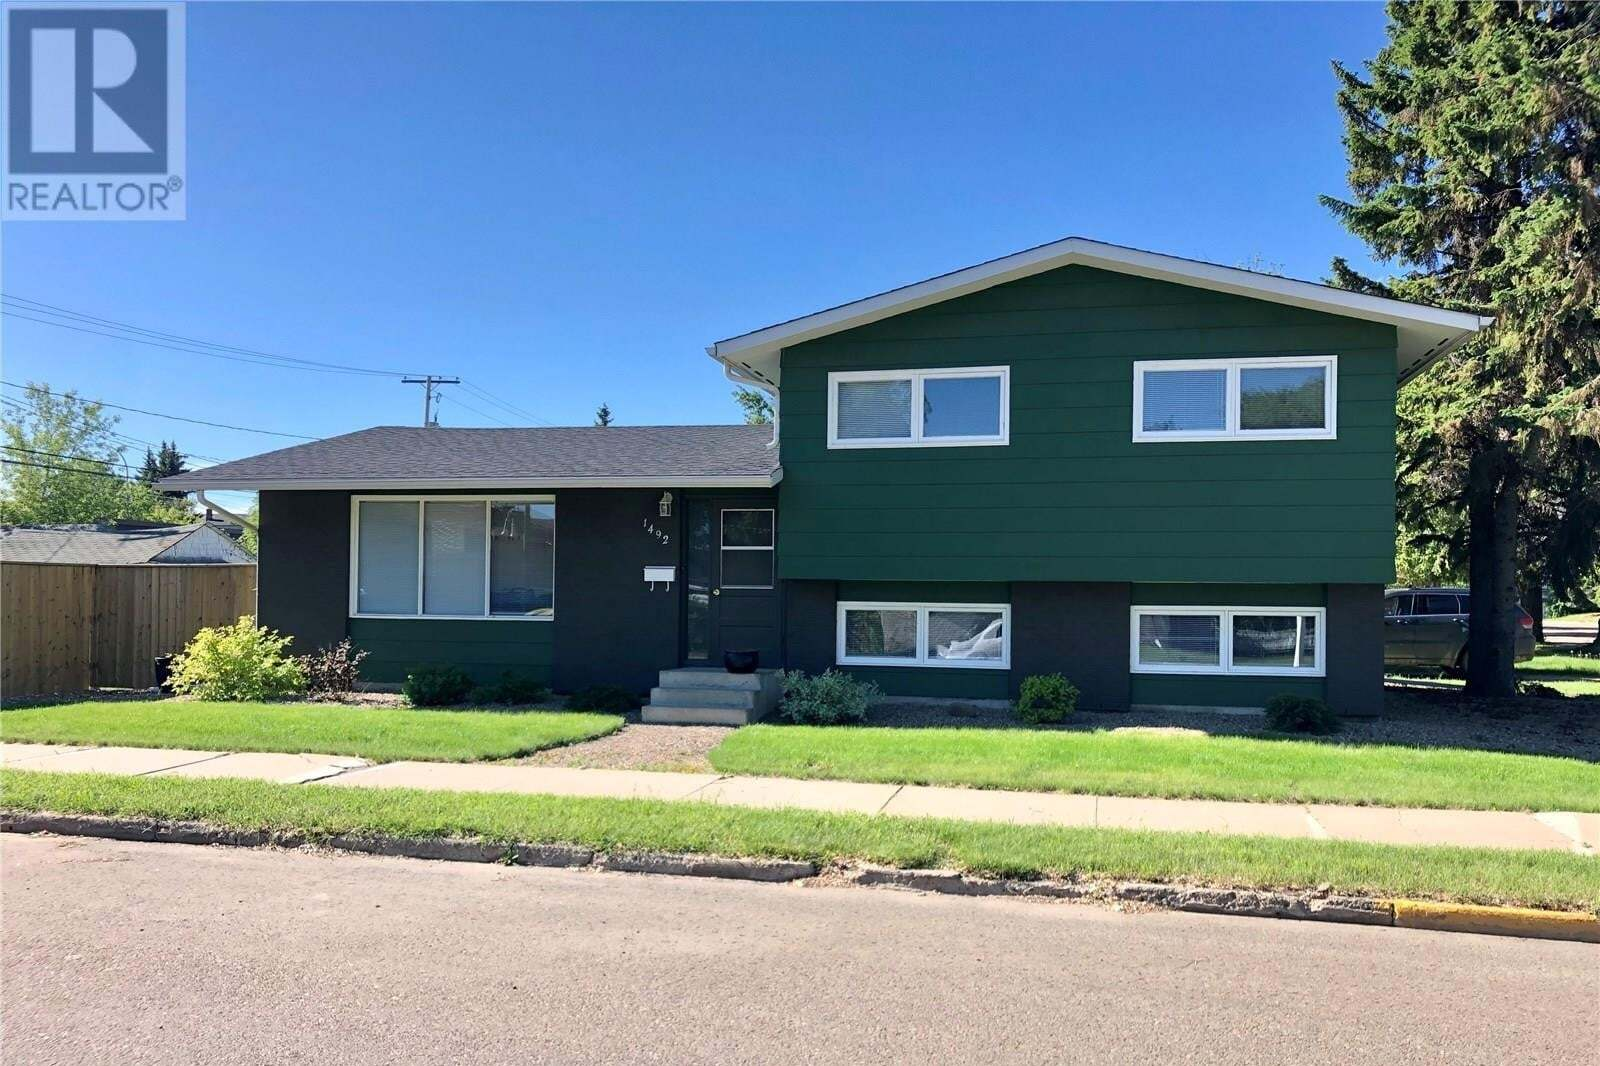 House for sale at 1492 99th St North Battleford Saskatchewan - MLS: SK813277